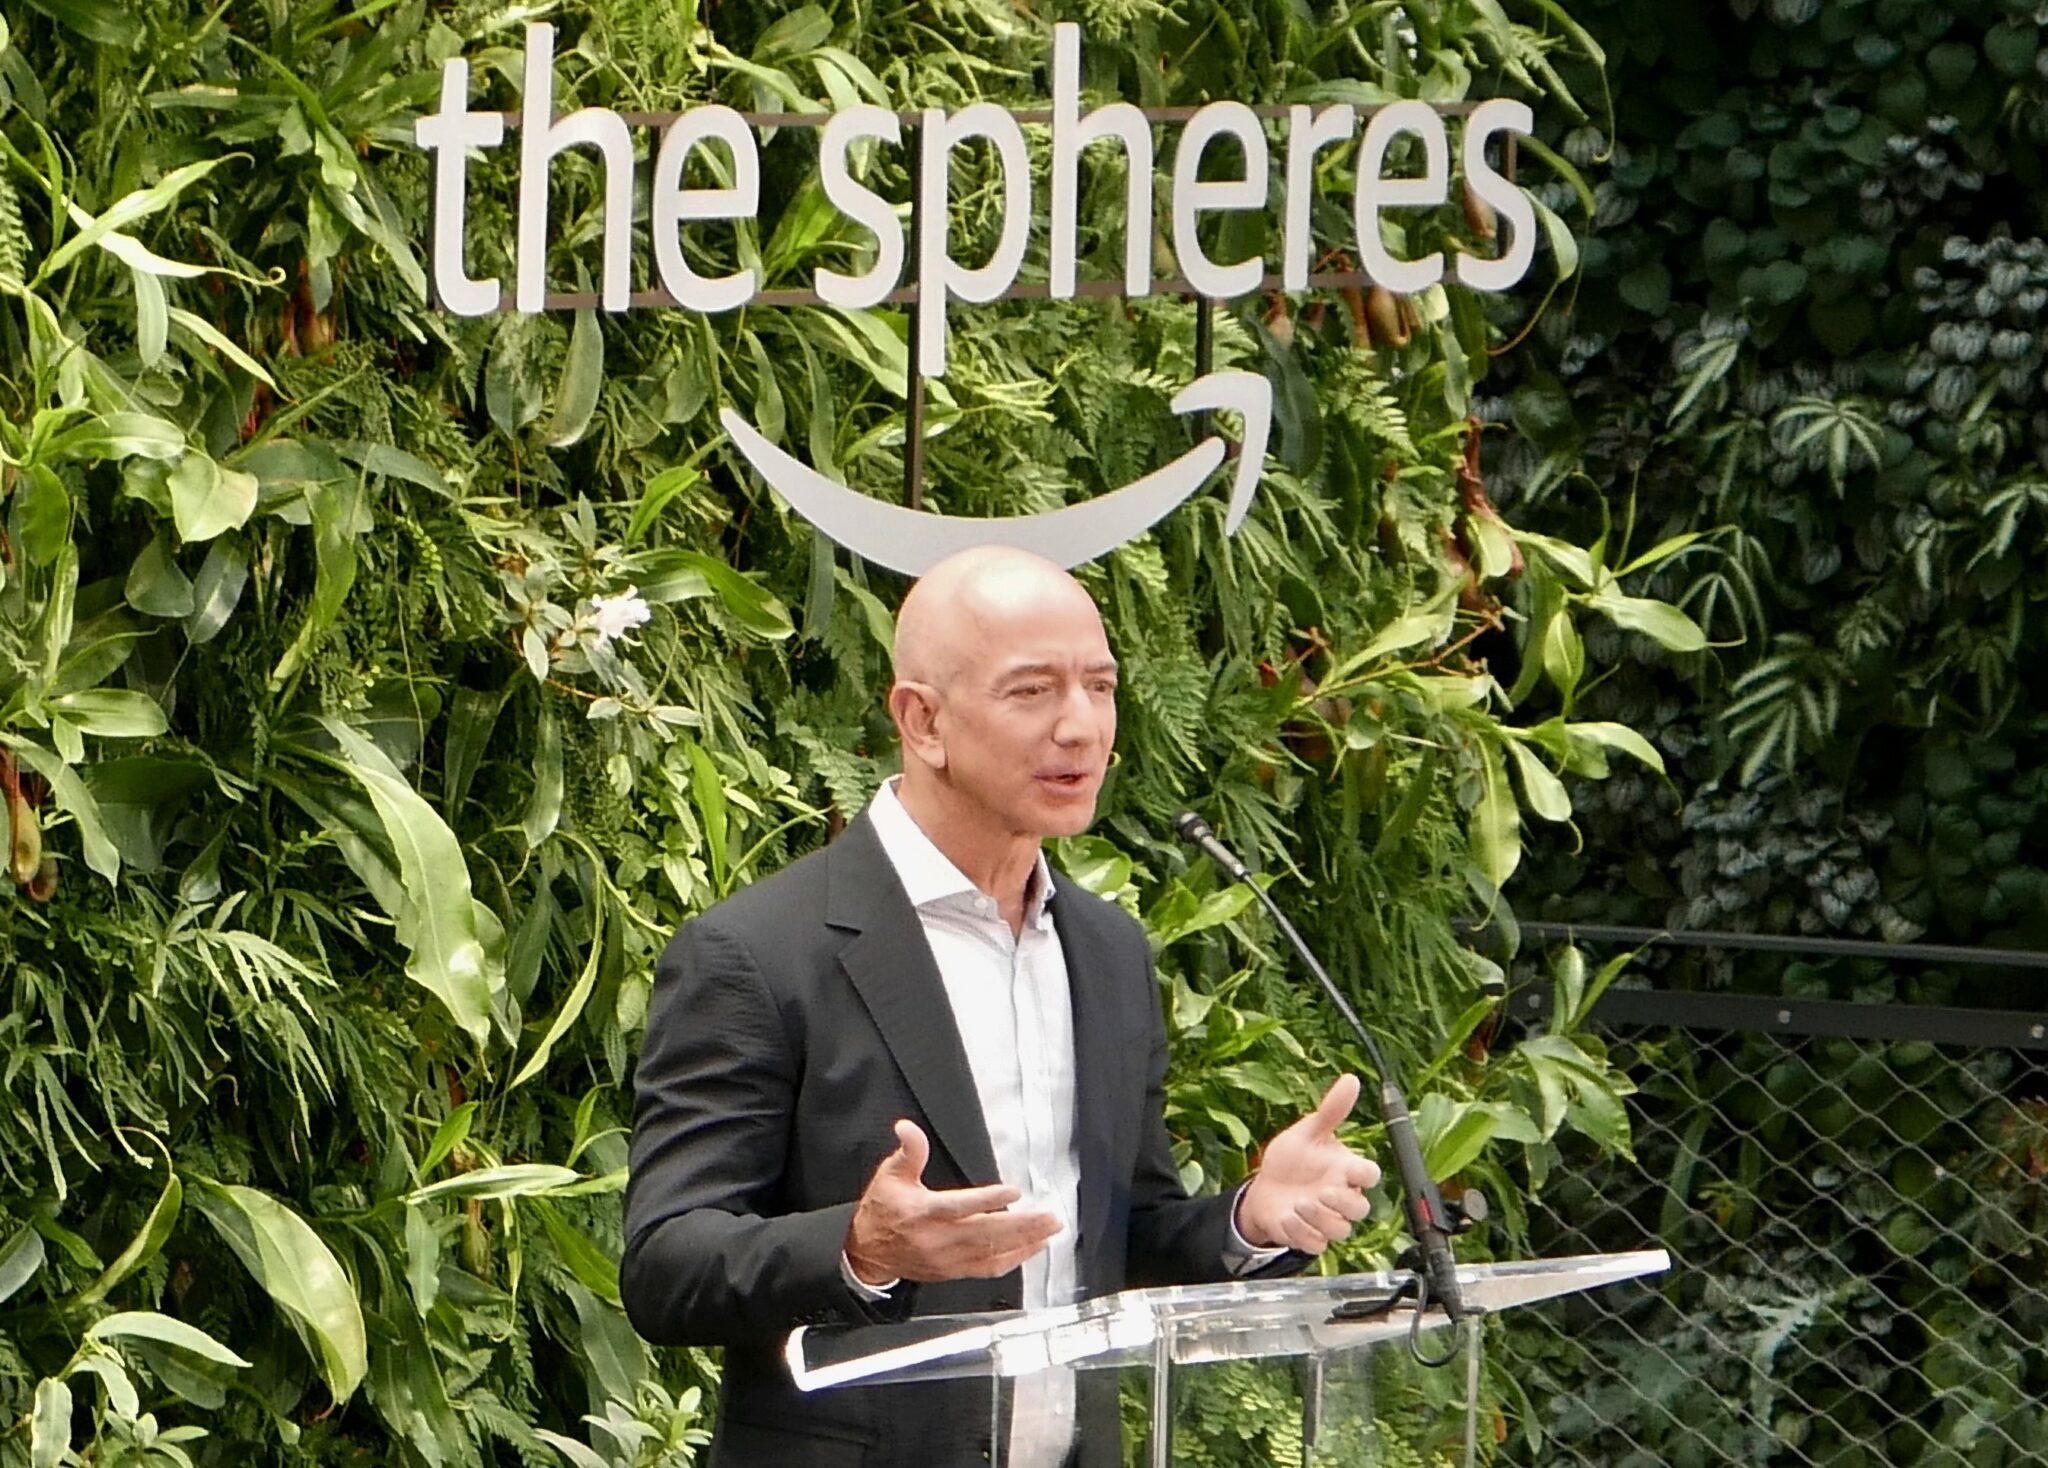 https://anysizedealsweek.com/wp-content/uploads/2020/11/Jeff-Bezos-1.jpg